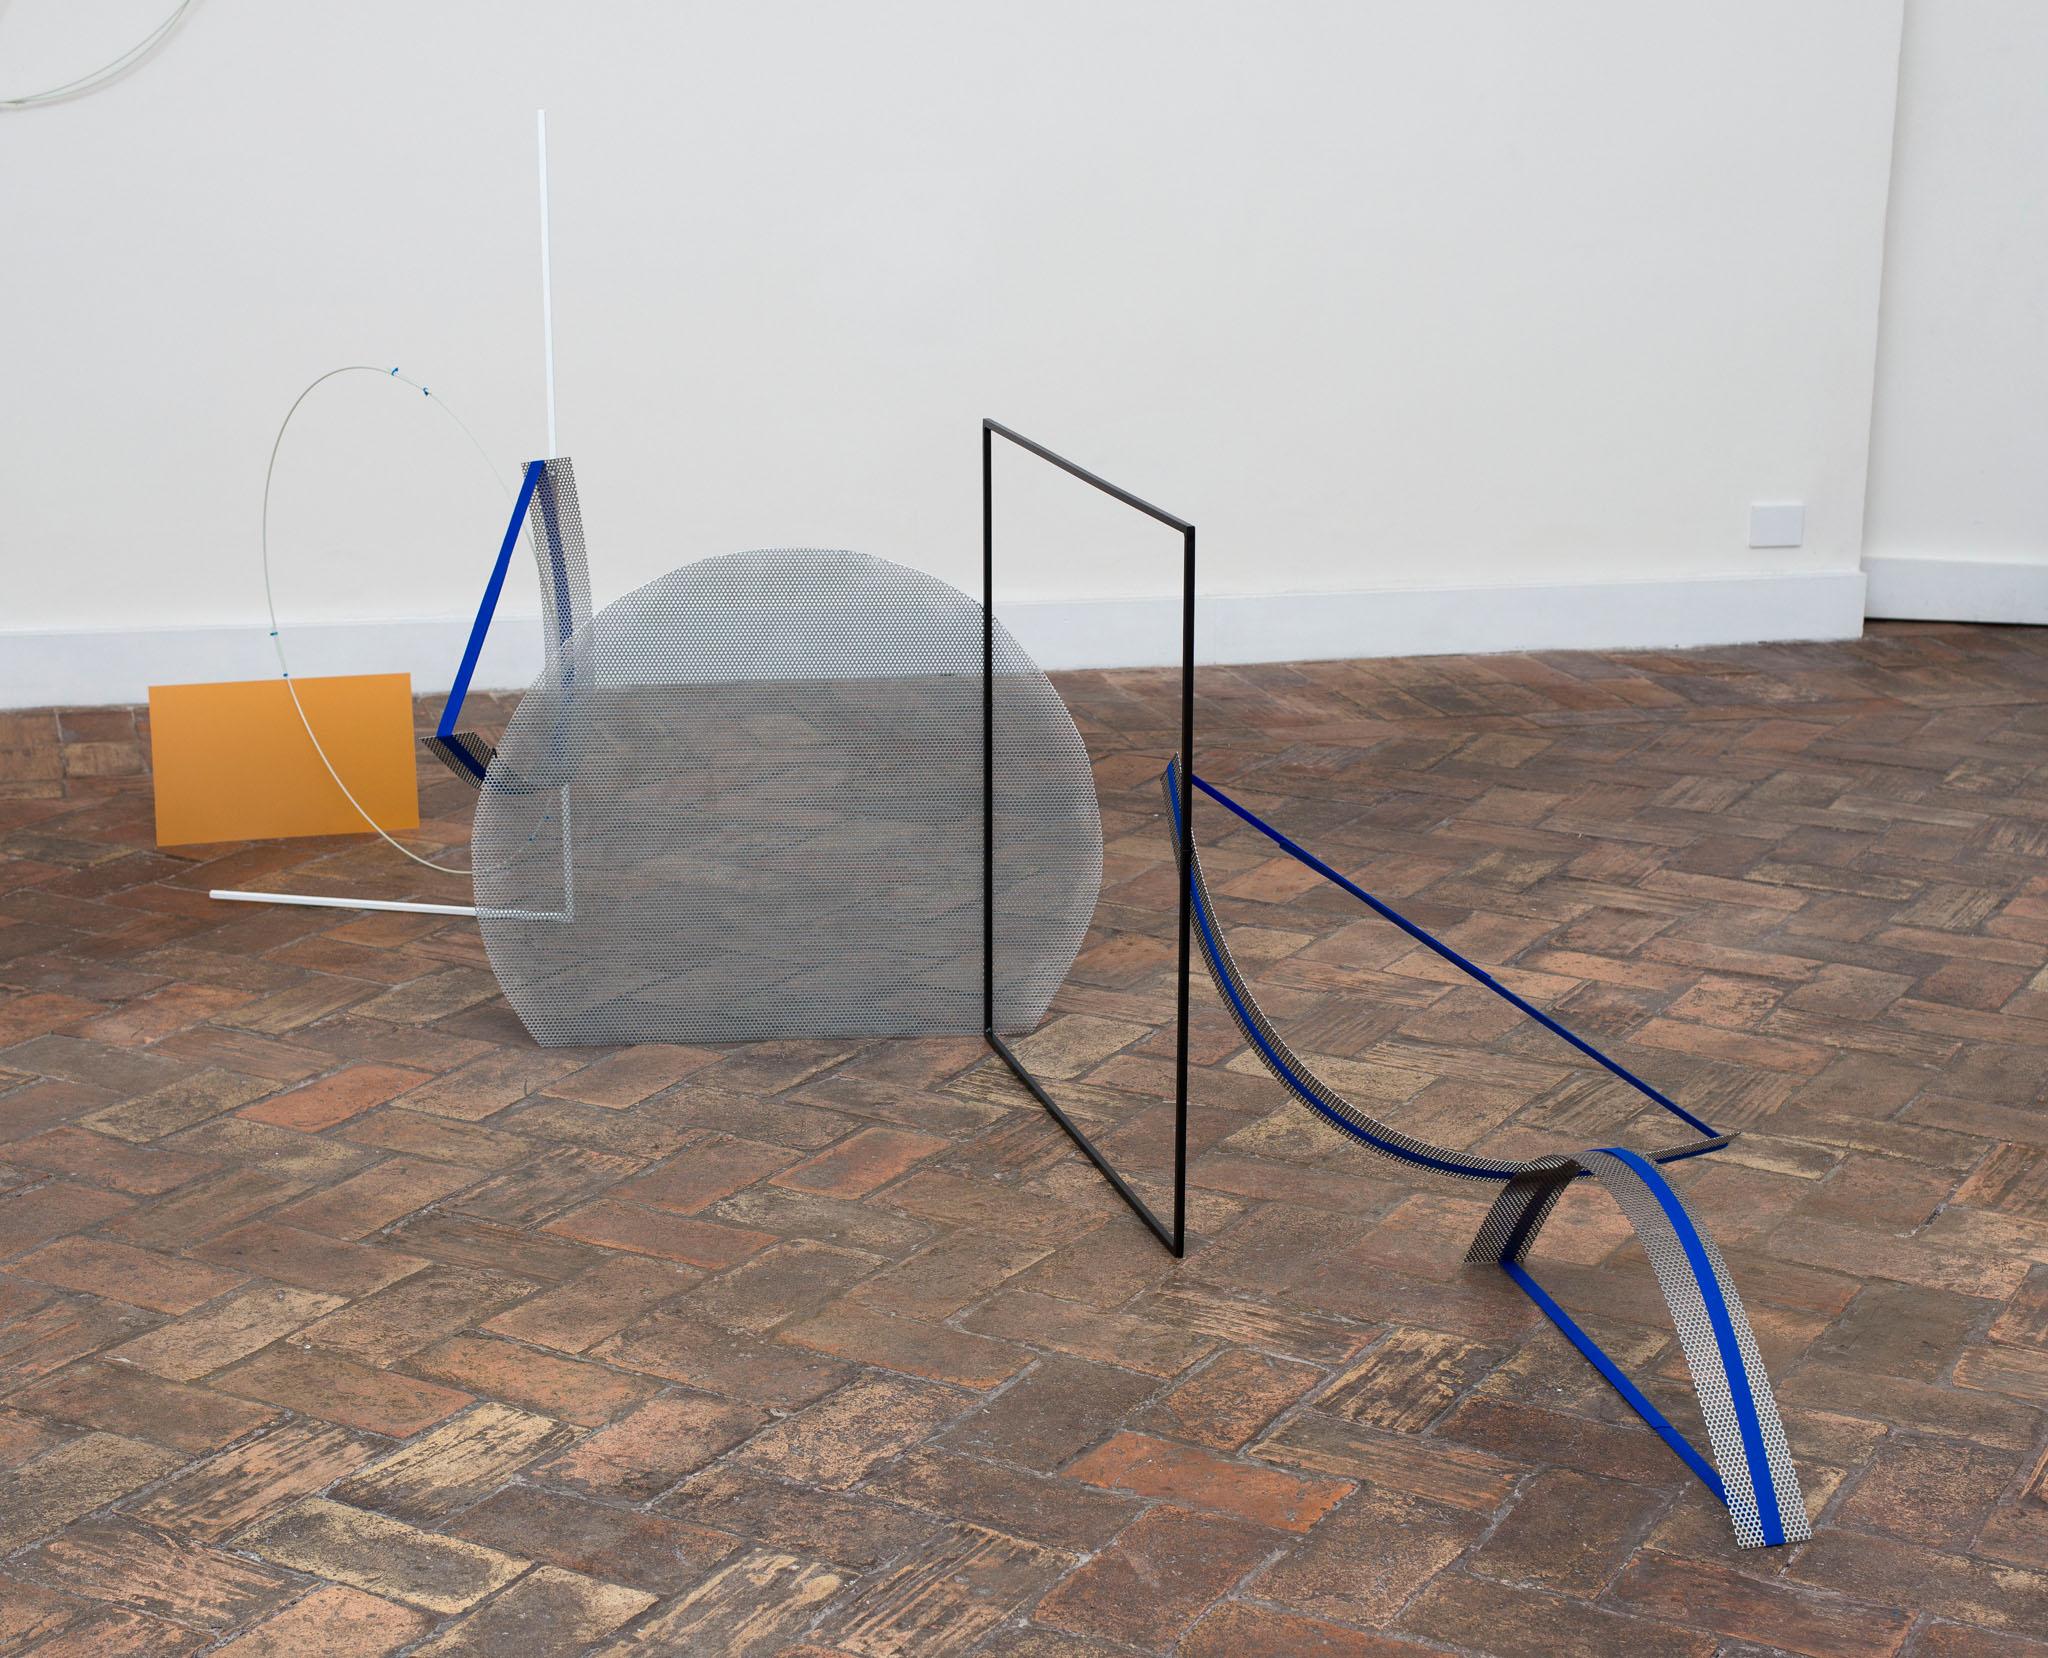 Alice Cattaneo, 'Untitled', 2015, Iron, paint, fiberglass, cable ties, plastic, velcro 140 x 300 x 150 cm .ca. Courtesy Galleria Marie-Laure. Photo: Giorgio Benni.